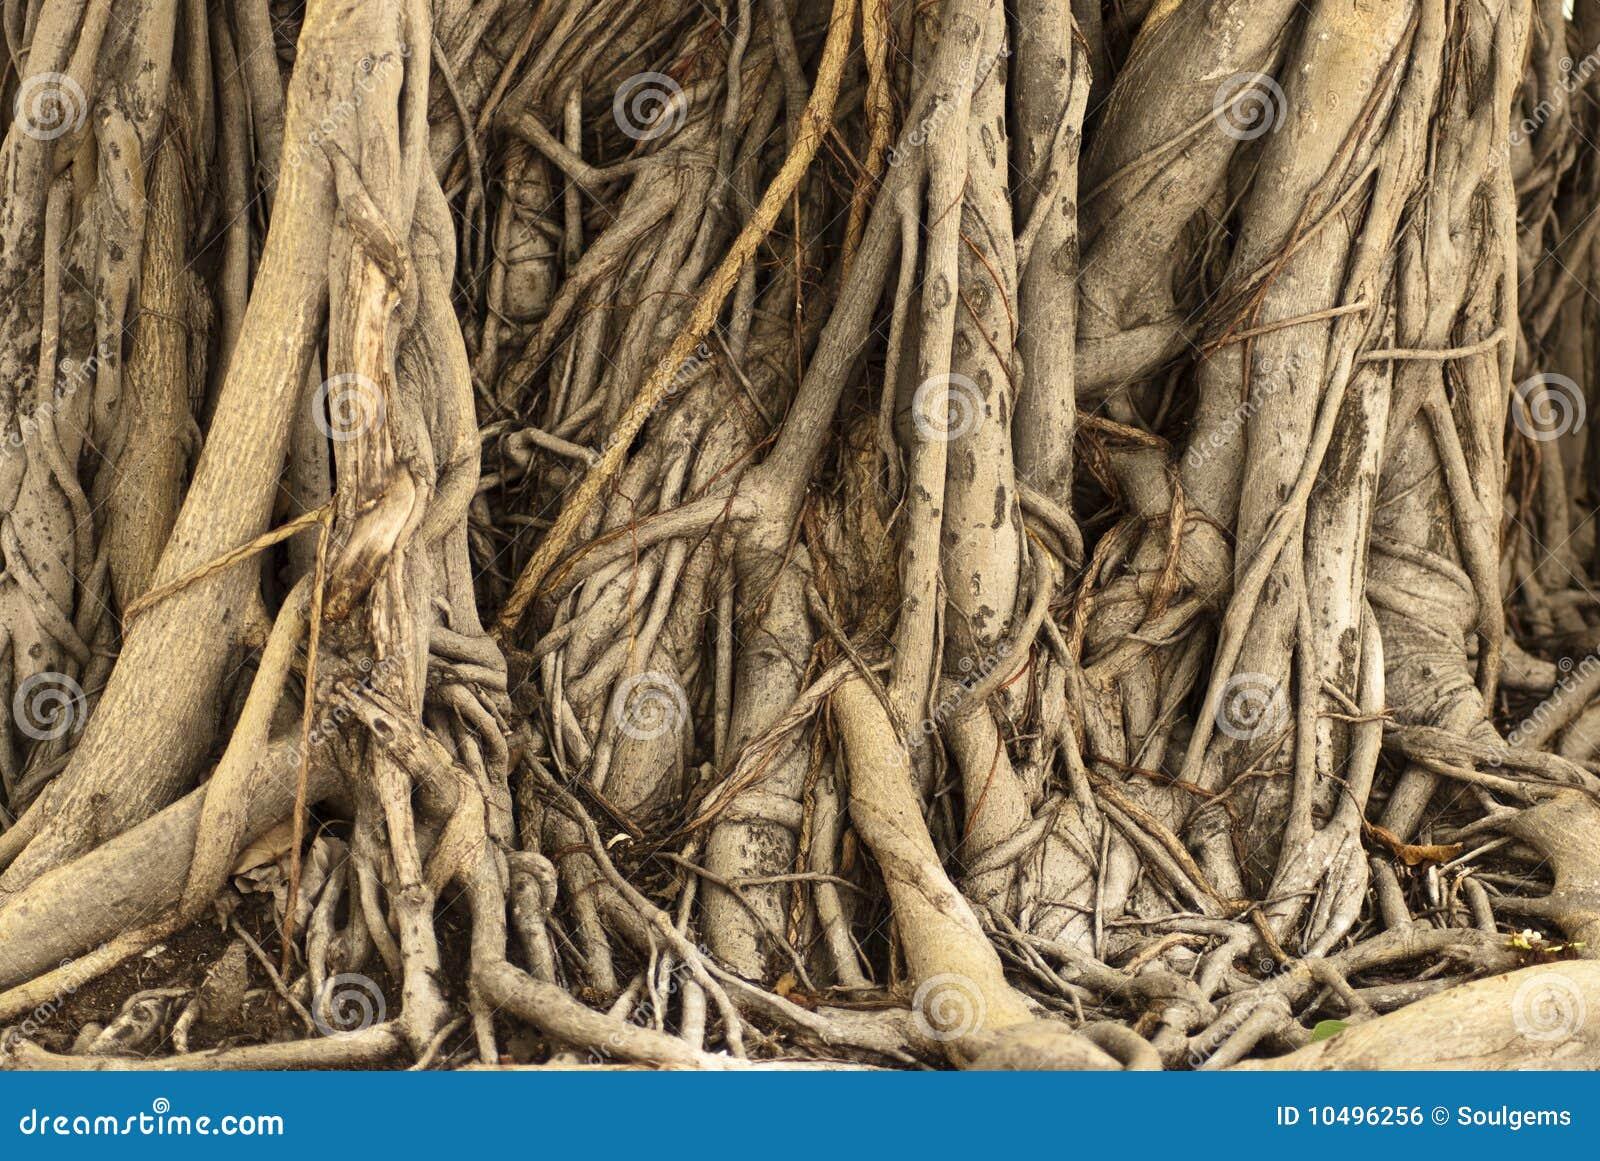 ficus baum wurzeln in kambodscha stockfoto bild von grow ficus 10496256. Black Bedroom Furniture Sets. Home Design Ideas